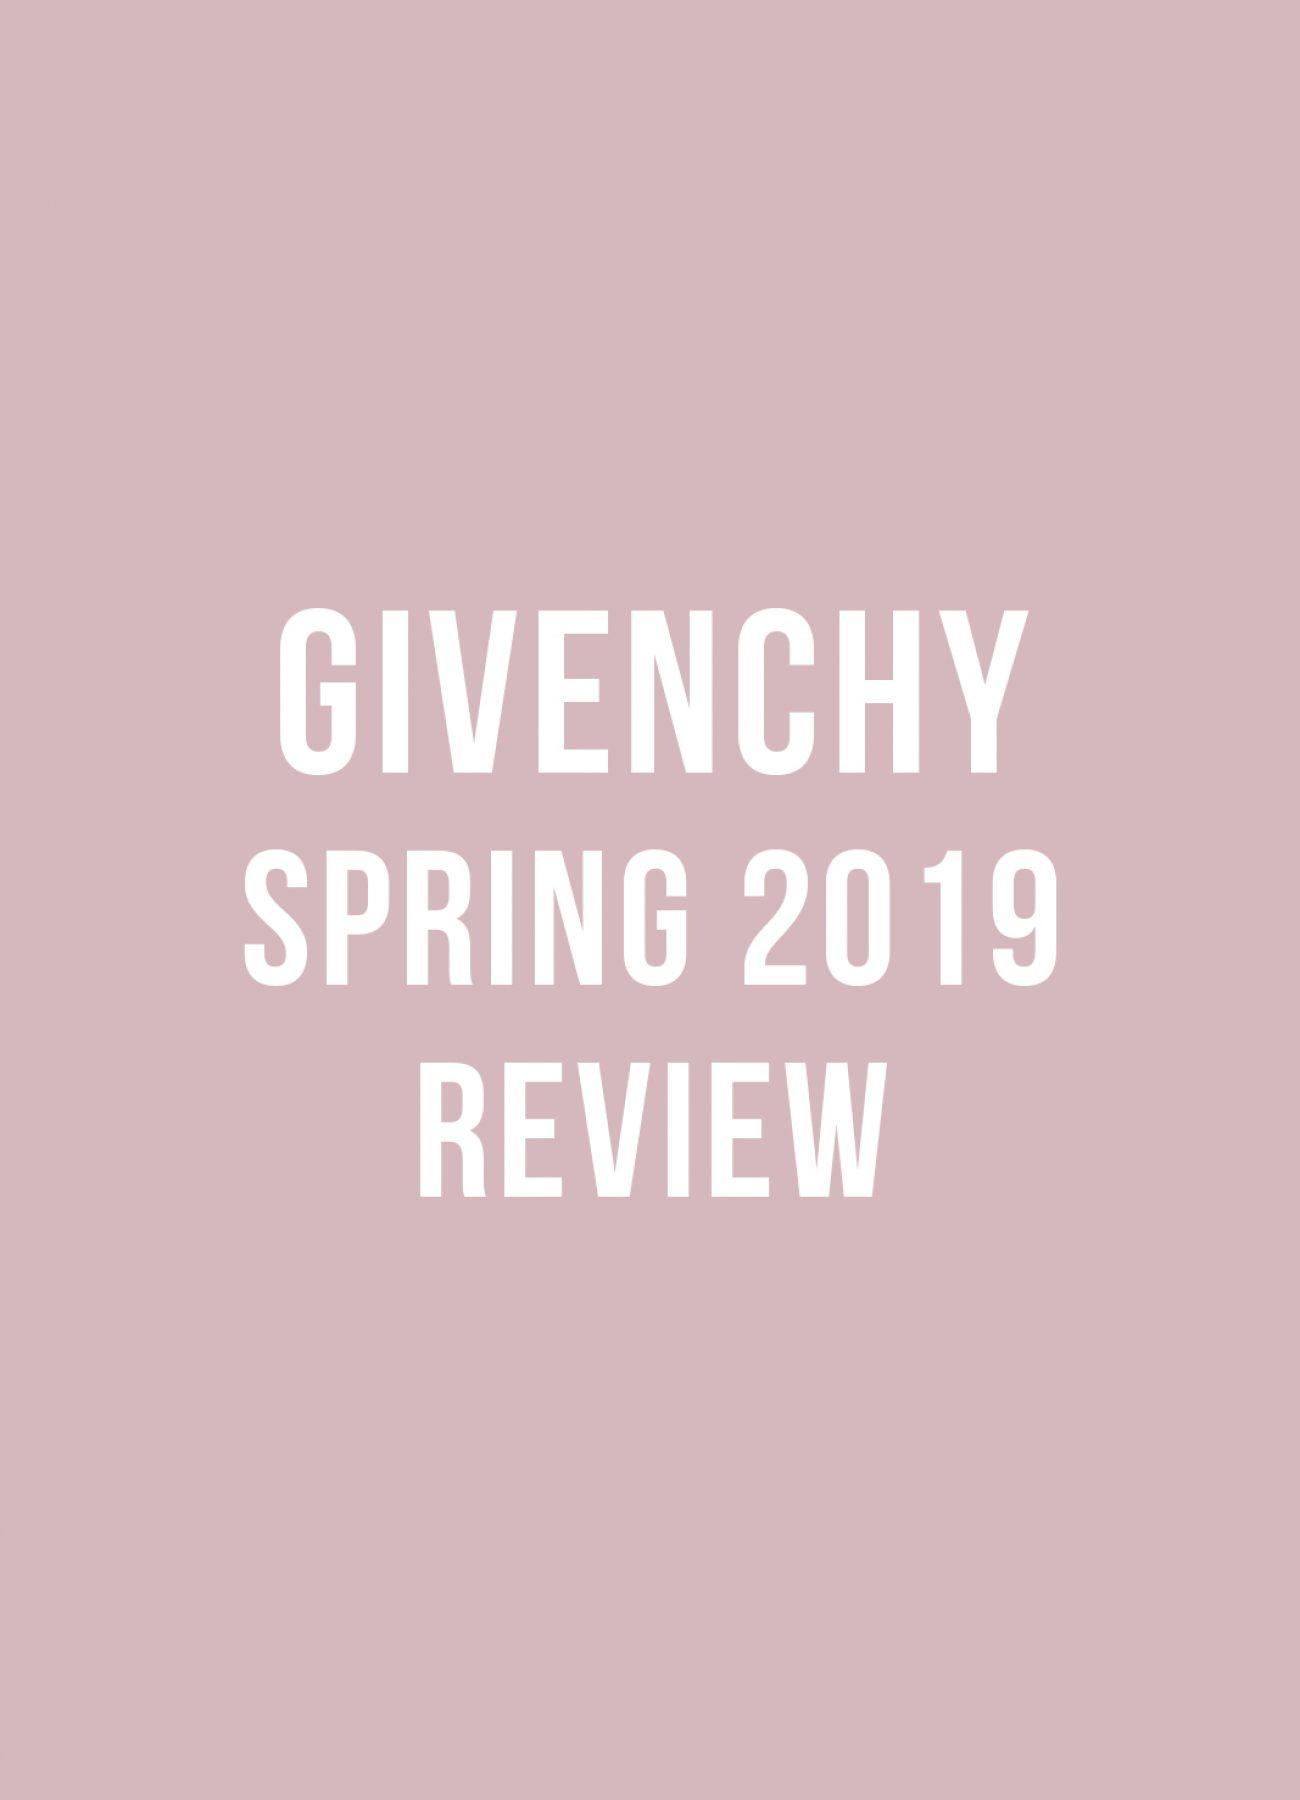 Givenchy spring 2019